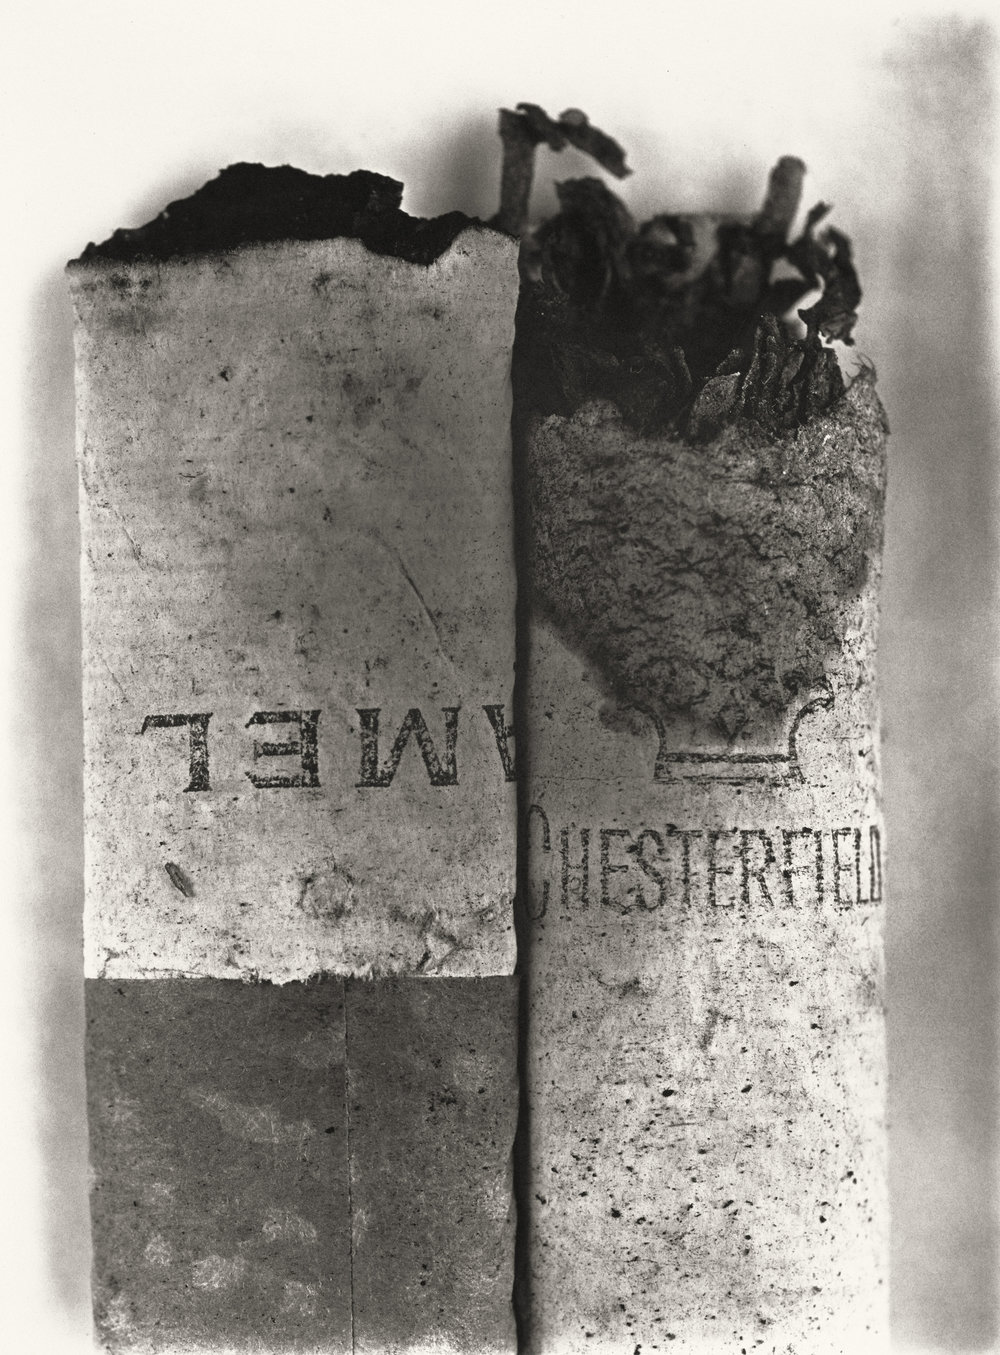 Irving Penn (American, 1917–2009)    Cigarette No. 37 , New York, 1972    Platinum-palladium print, 1975  23 ½ × 17 ⅜ in. (59.7 × 44.1 cm)  The Metropolitan Museum of Art, New York  Promised Gift of The Irving Penn Foundation  © The Irving Penn Foundation